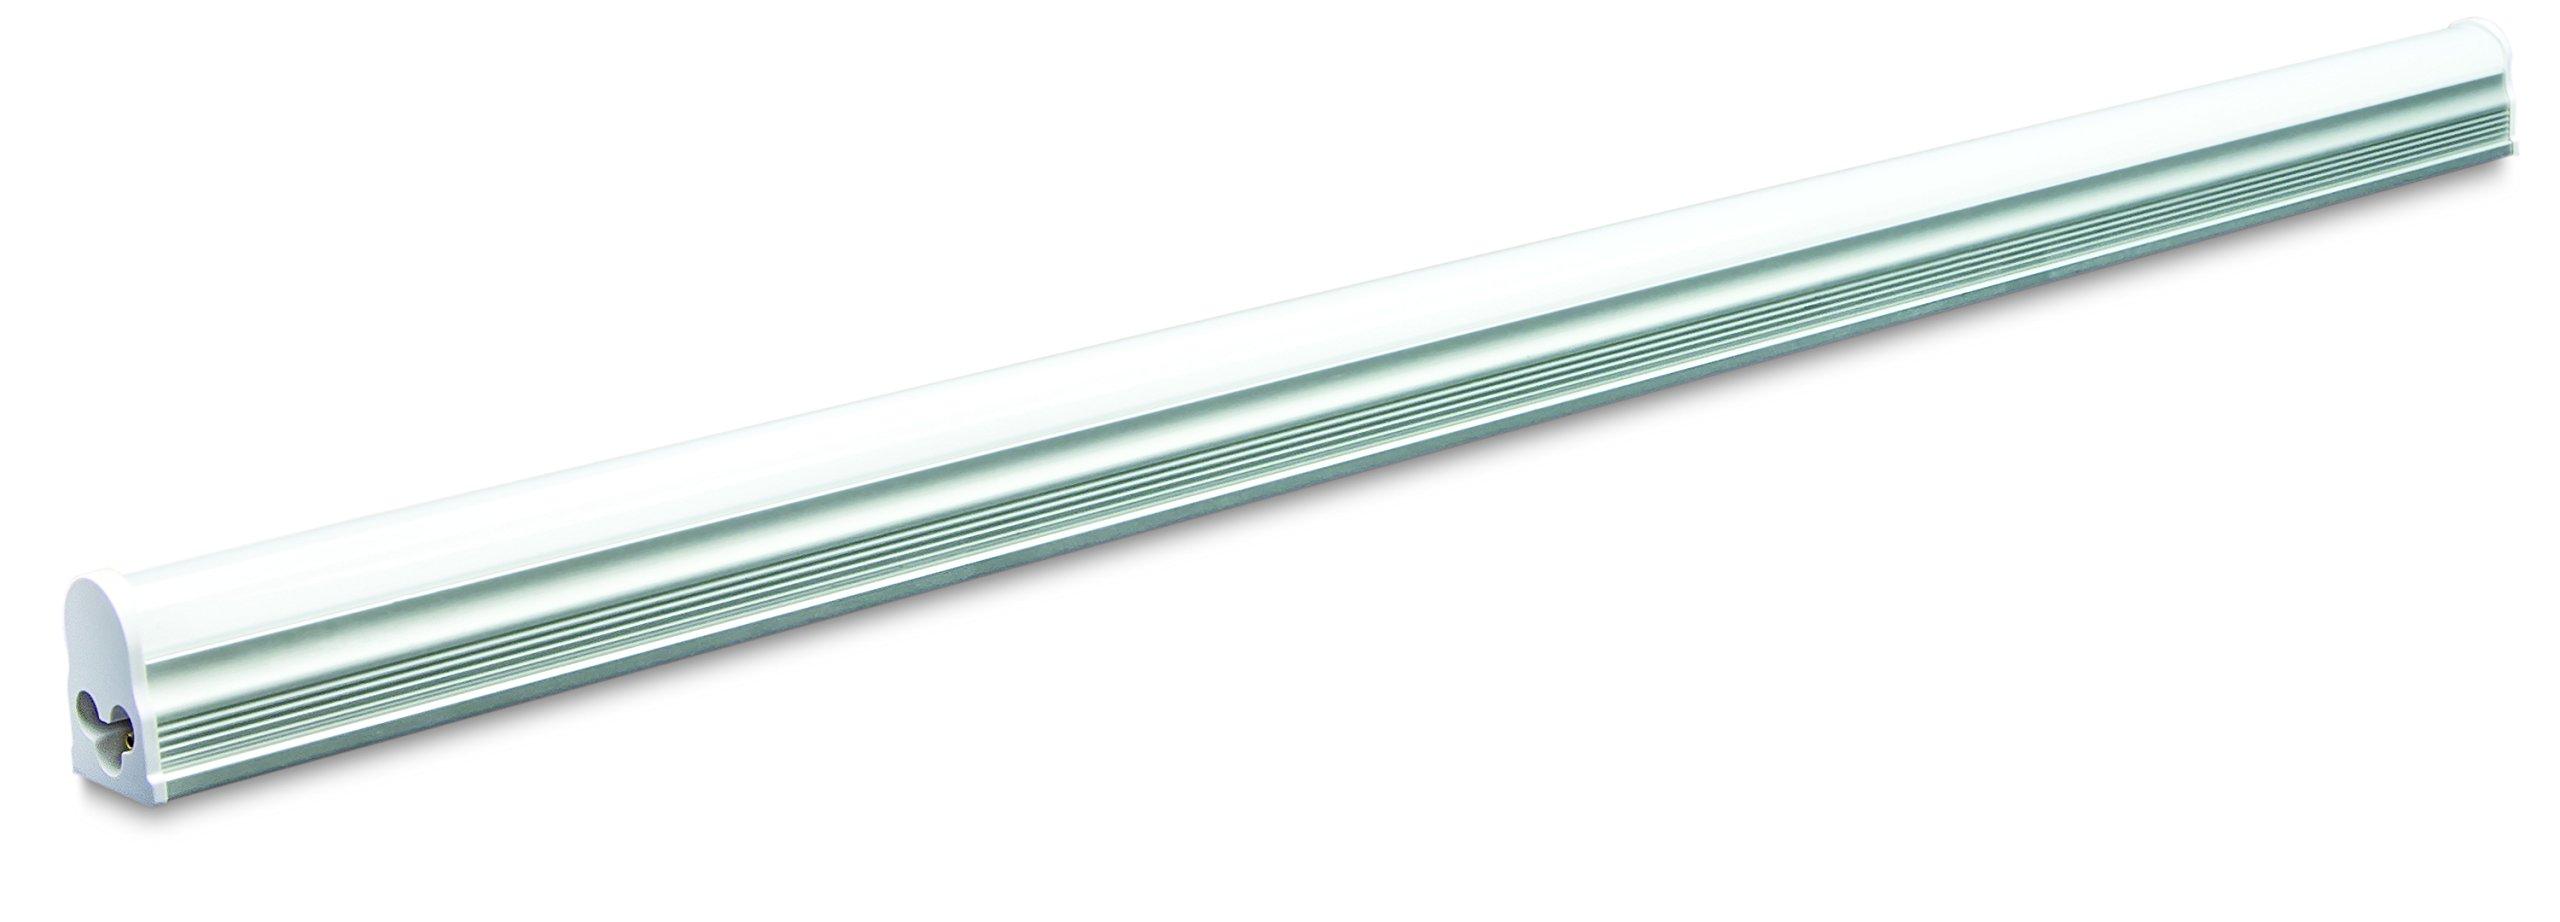 Forest Lighting T5N250 5000K 12W LED Integrated T5 Tube Light (20 Pack), 2' by Forest Lighting